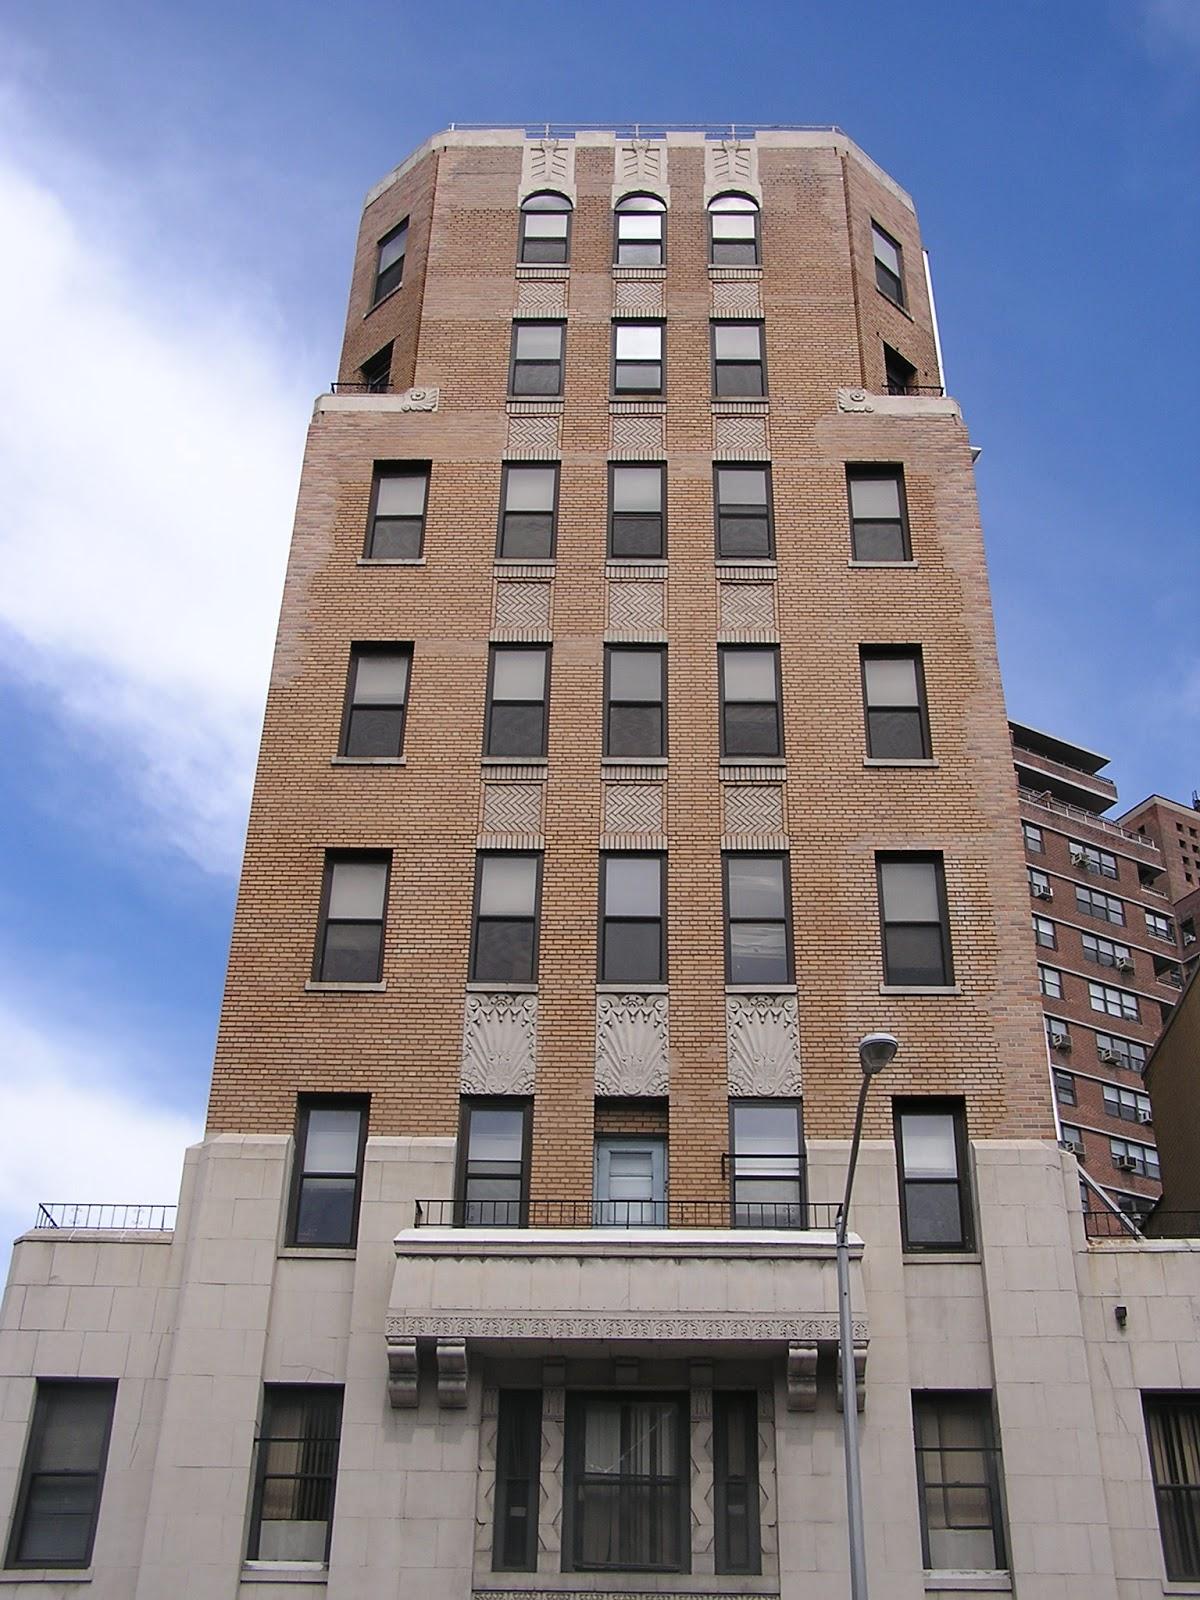 Samuel gruber 39 s jewish art monuments usa new york city for New york landmarks